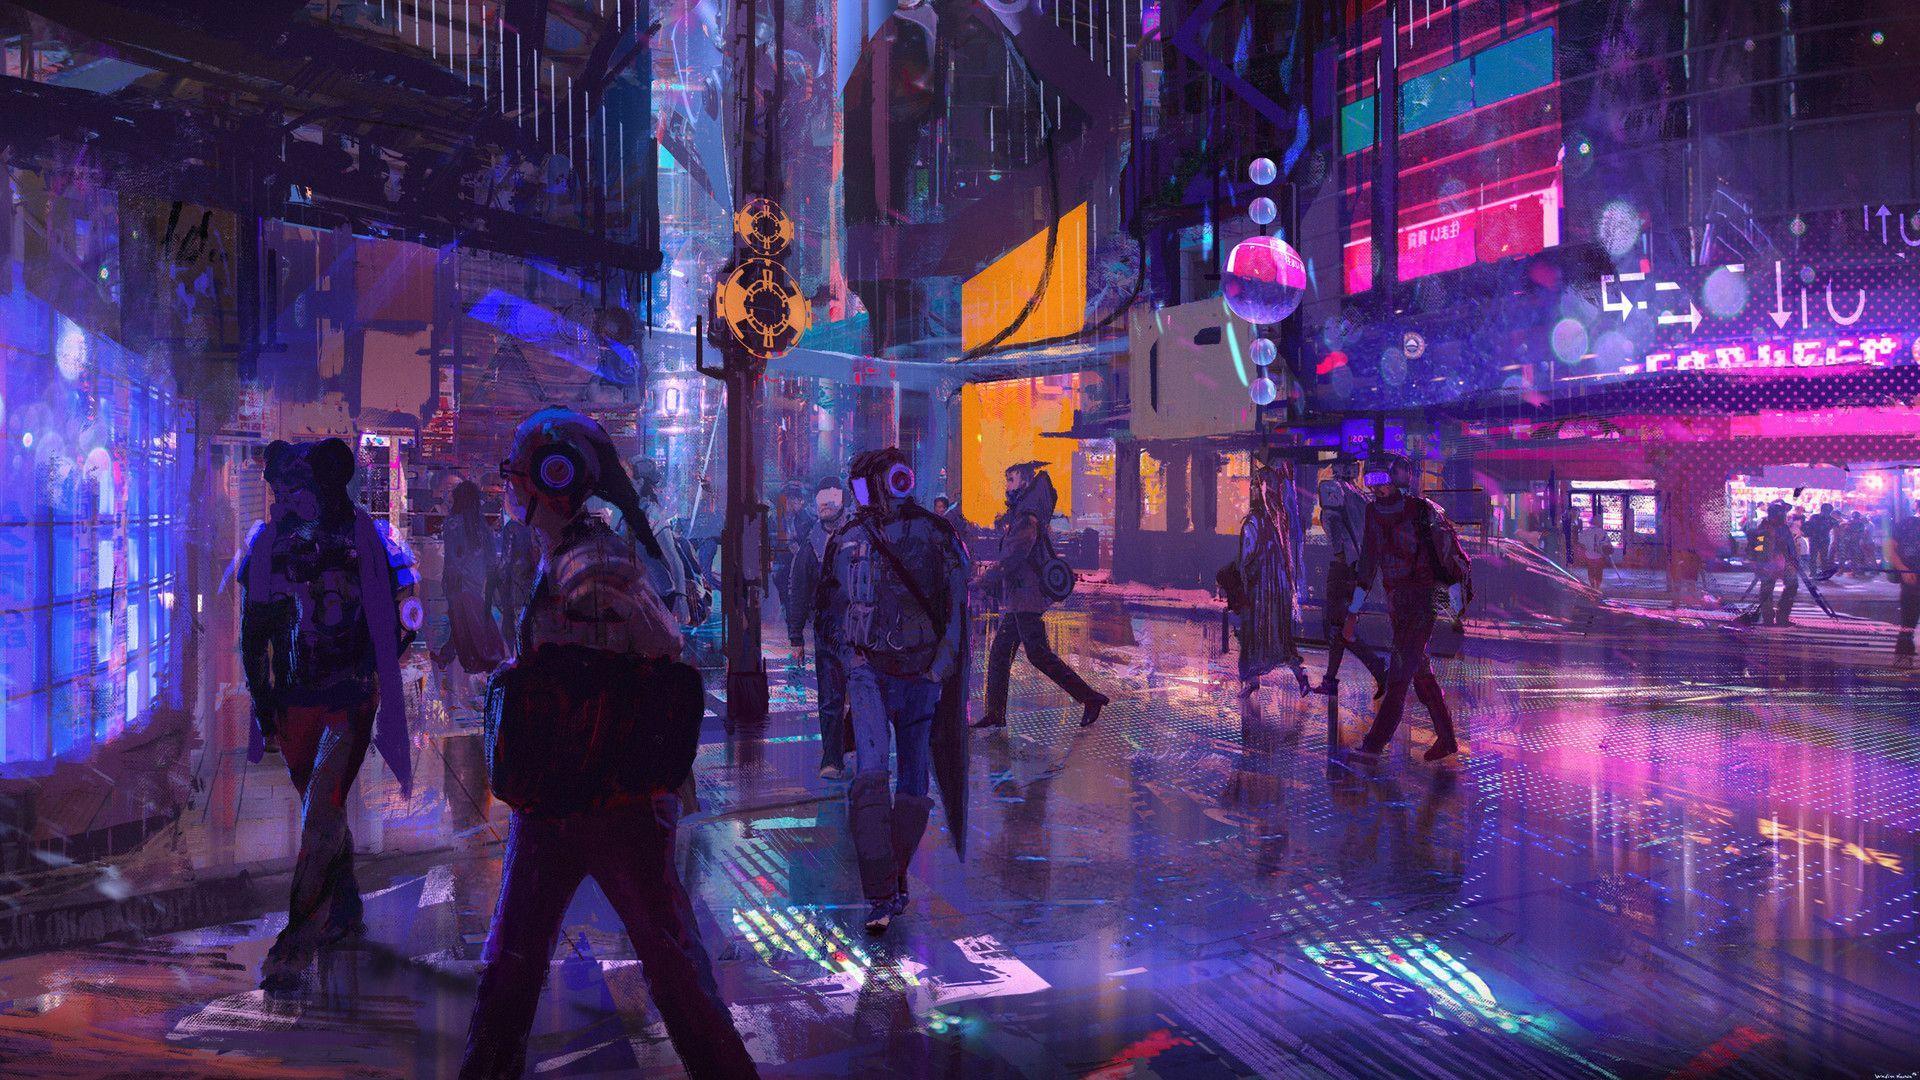 Cyberpunk Wallpapers Top Free Cyberpunk Backgrounds